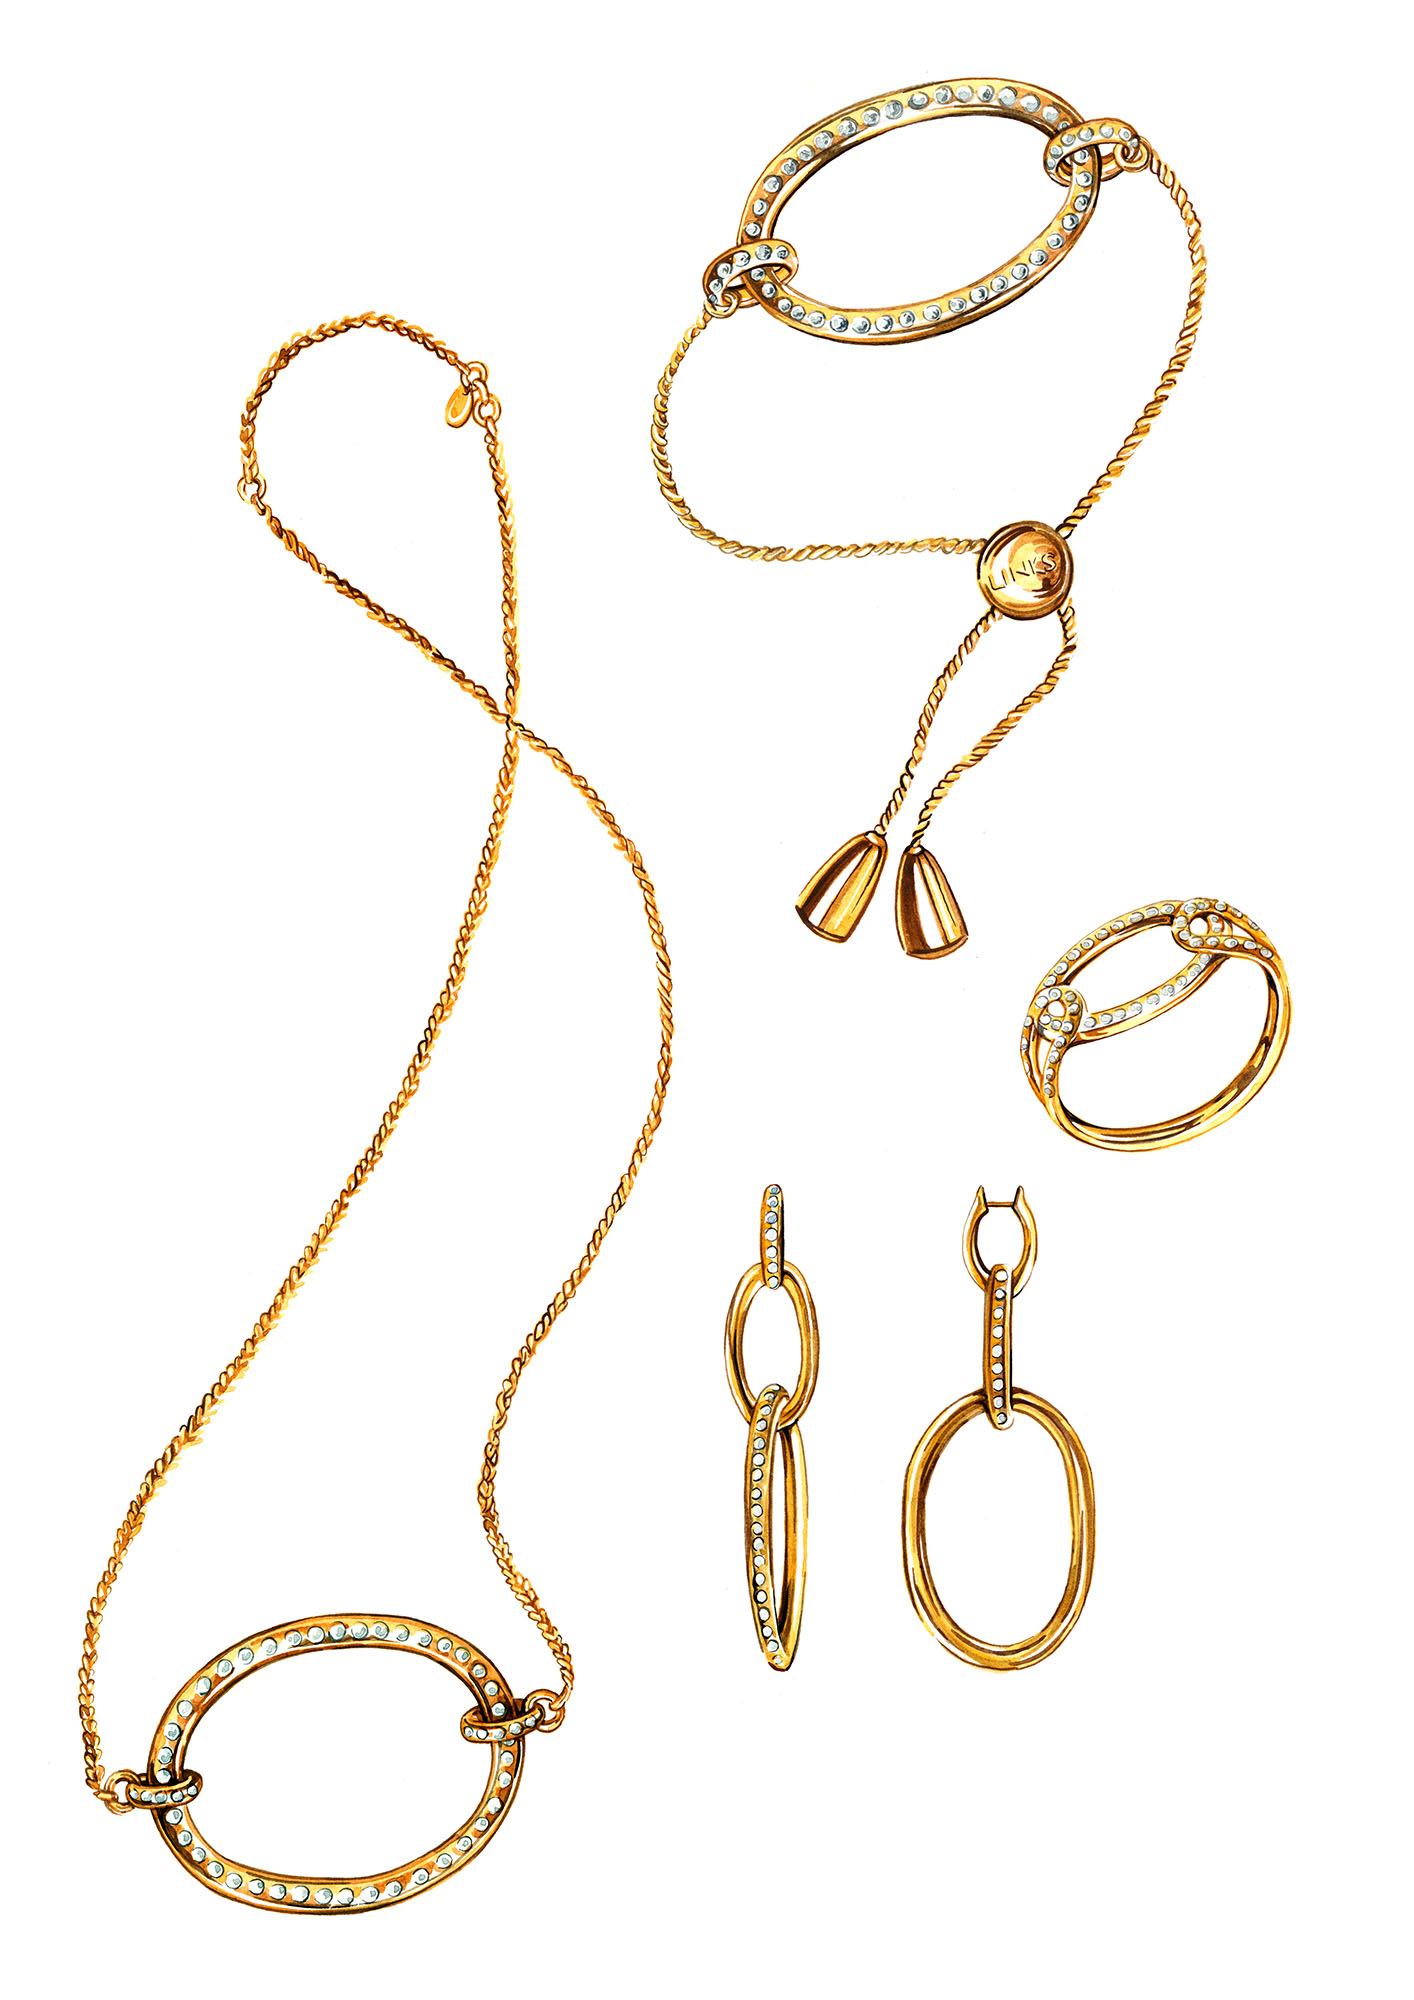 jewellery illustration watercolour